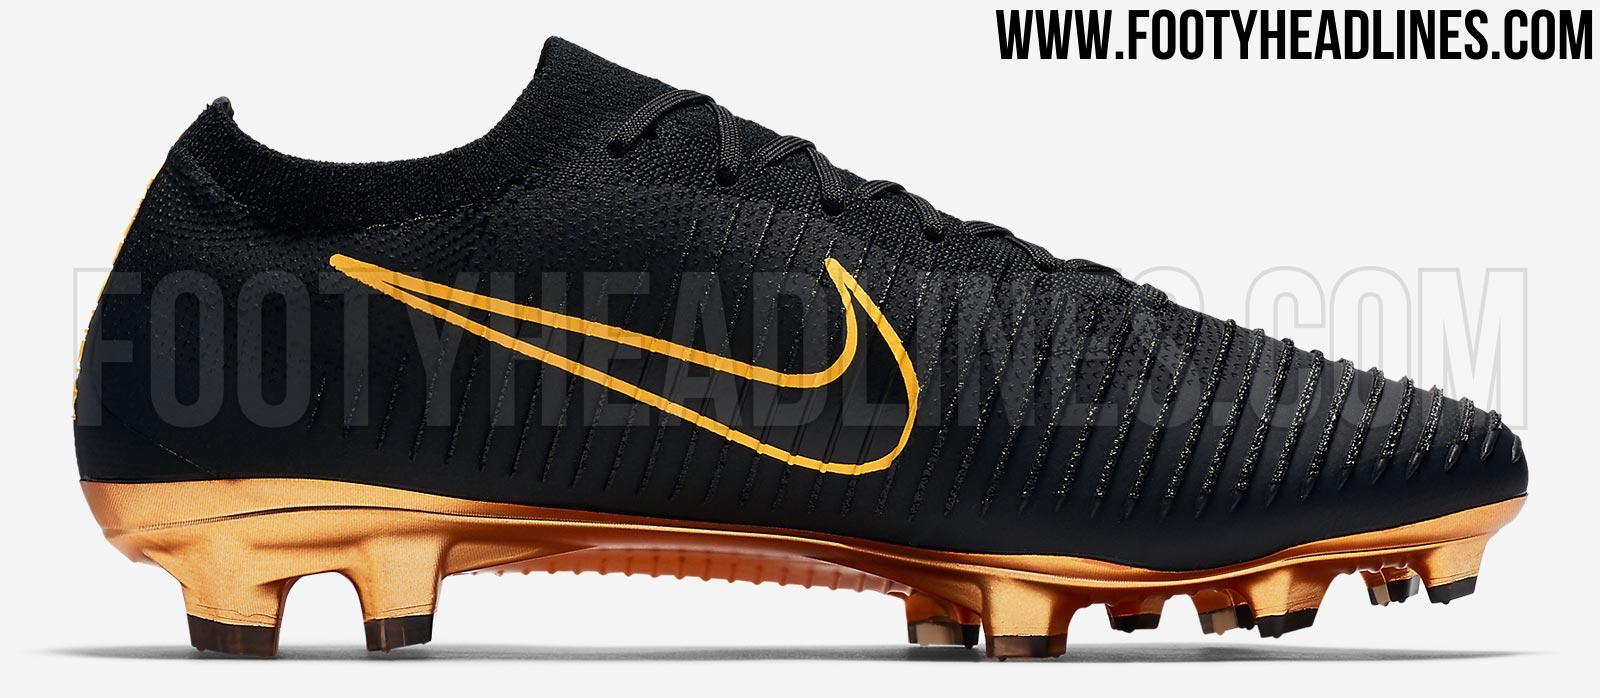 nike original football shoes lifestyle soccer shoes